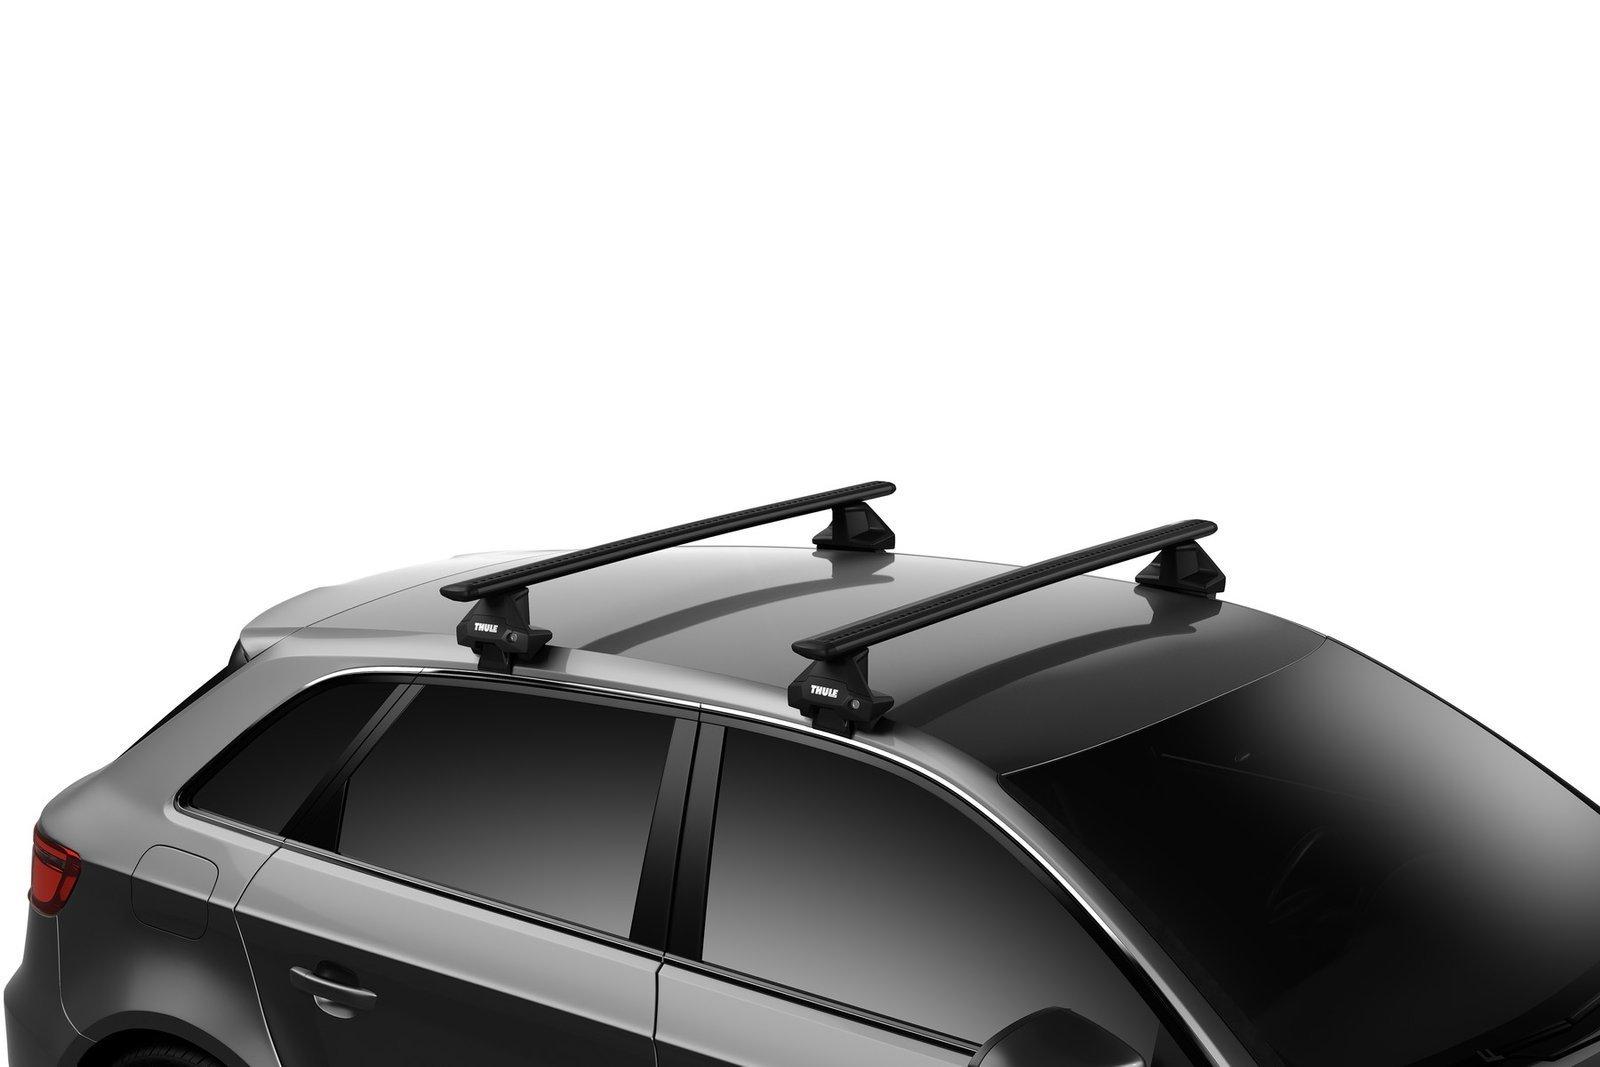 roof rack thule wingbar evo black audi a4 b8 4 dr sedan 2008 2015